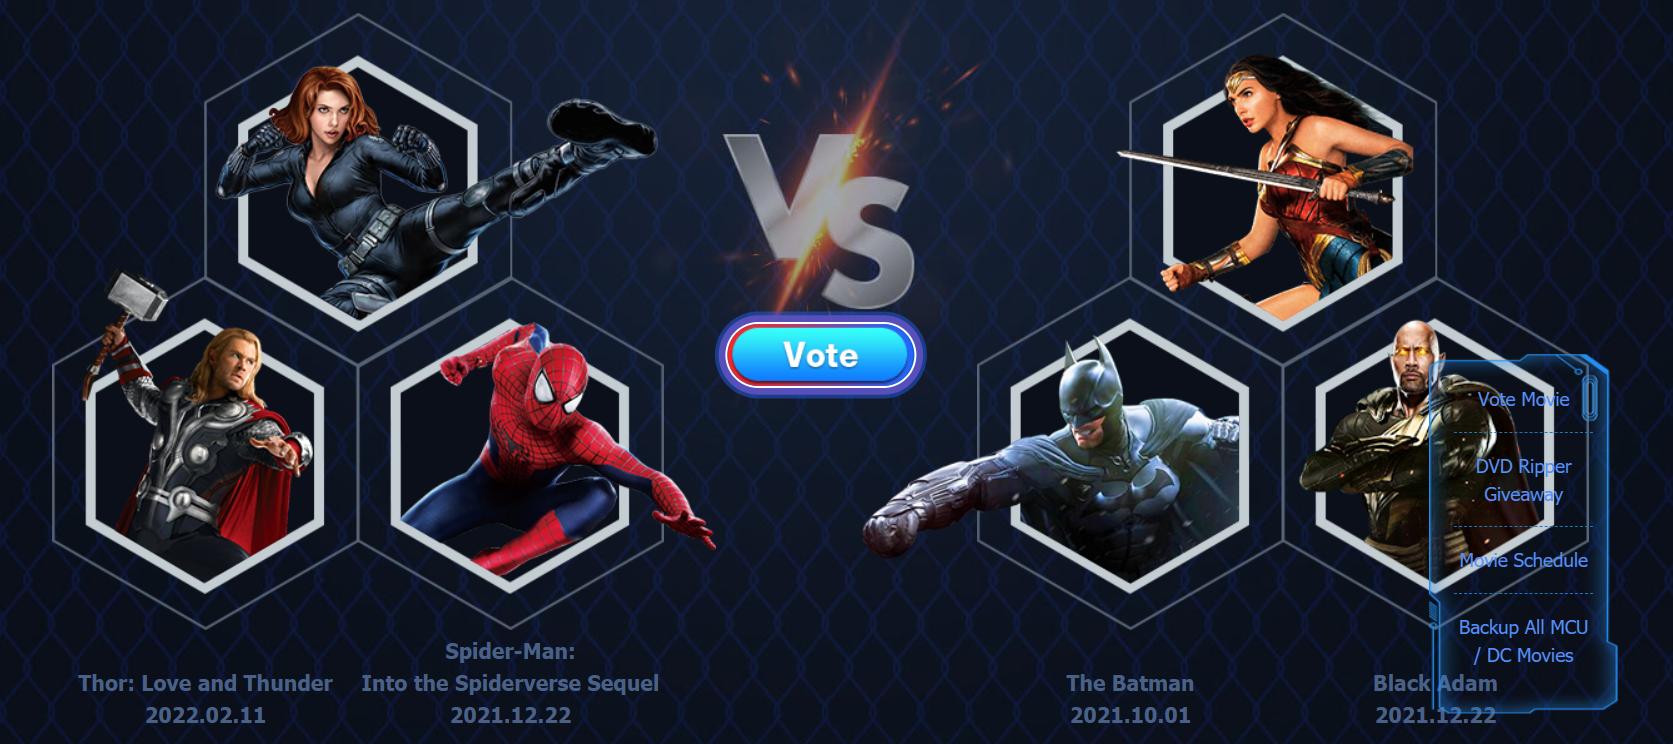 vote for superhero